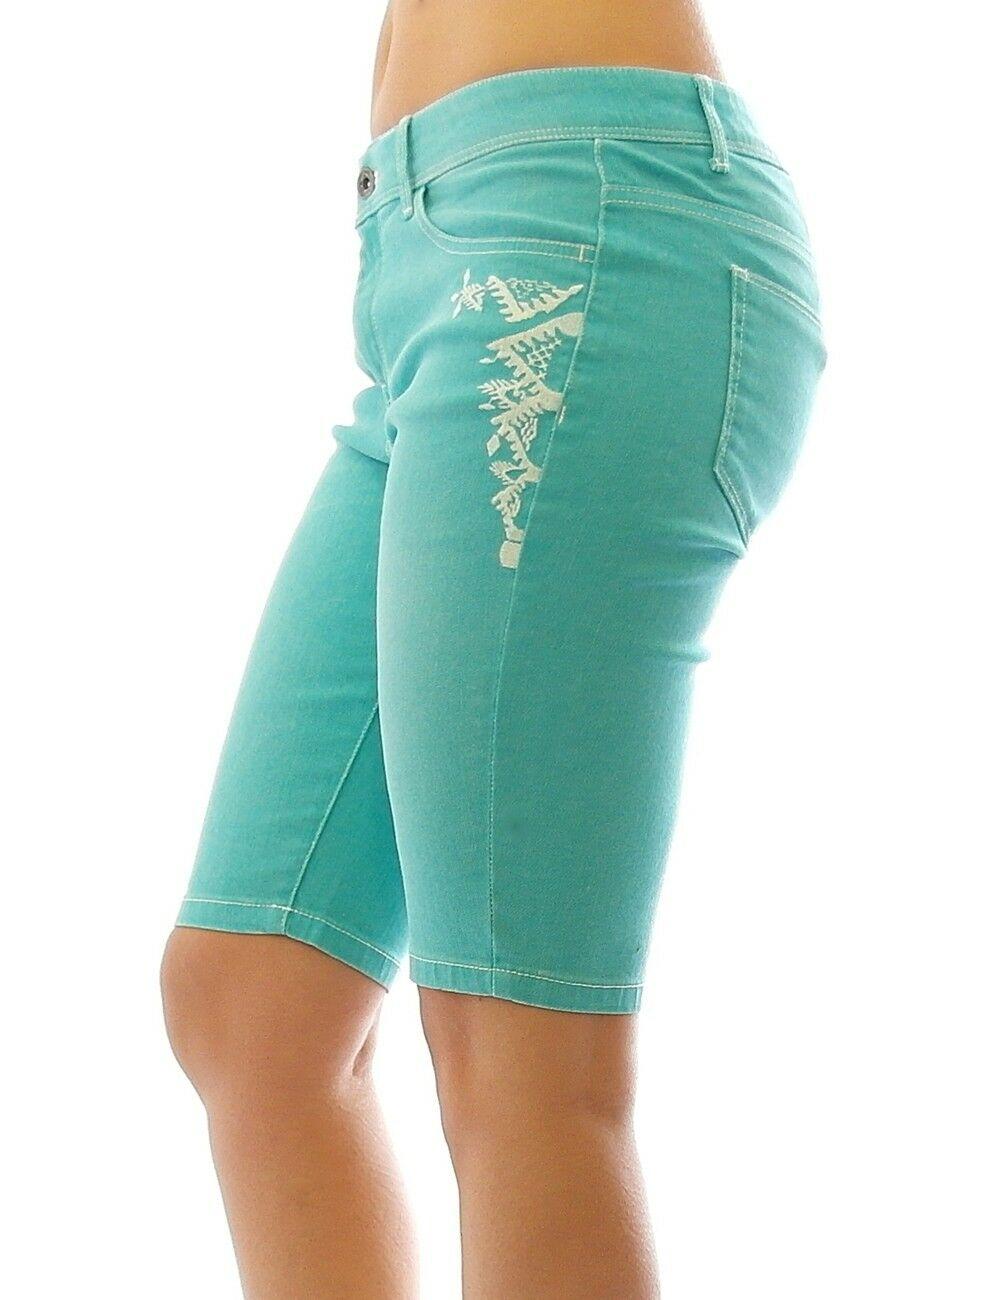 rainbow damen jeans bermuda stickerei kurze hose shorts stretch aqua 923057 kaufen bei yesetshop. Black Bedroom Furniture Sets. Home Design Ideas